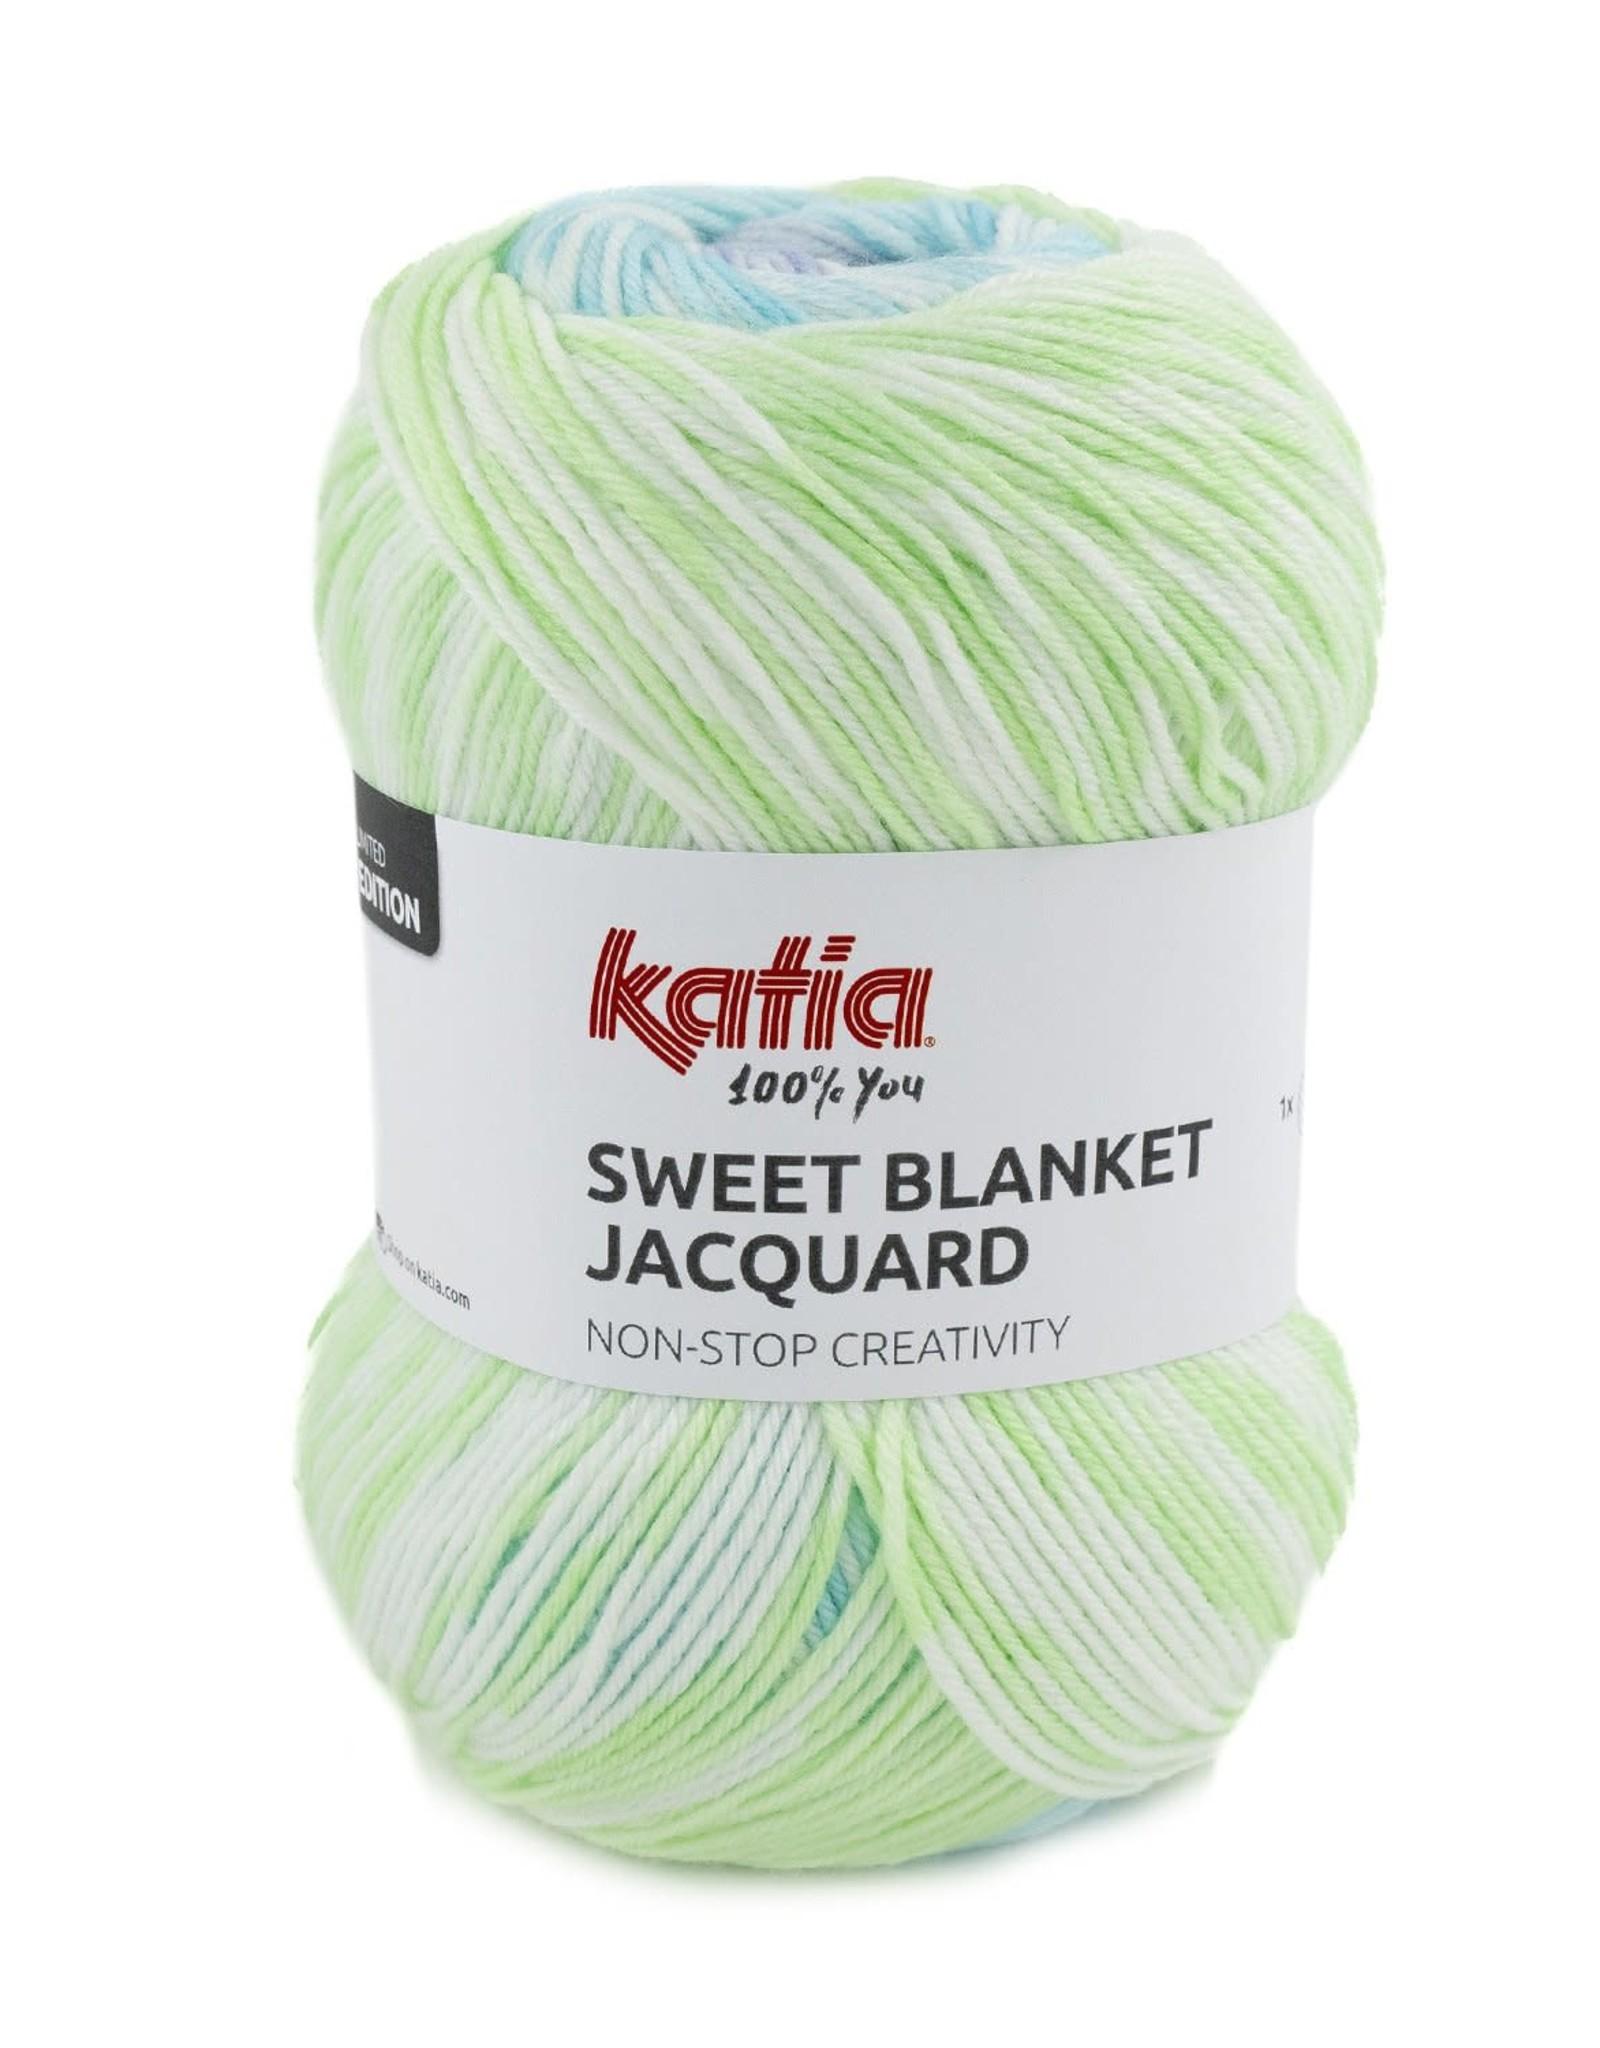 Katia Sweet Blanket Jacquard 305